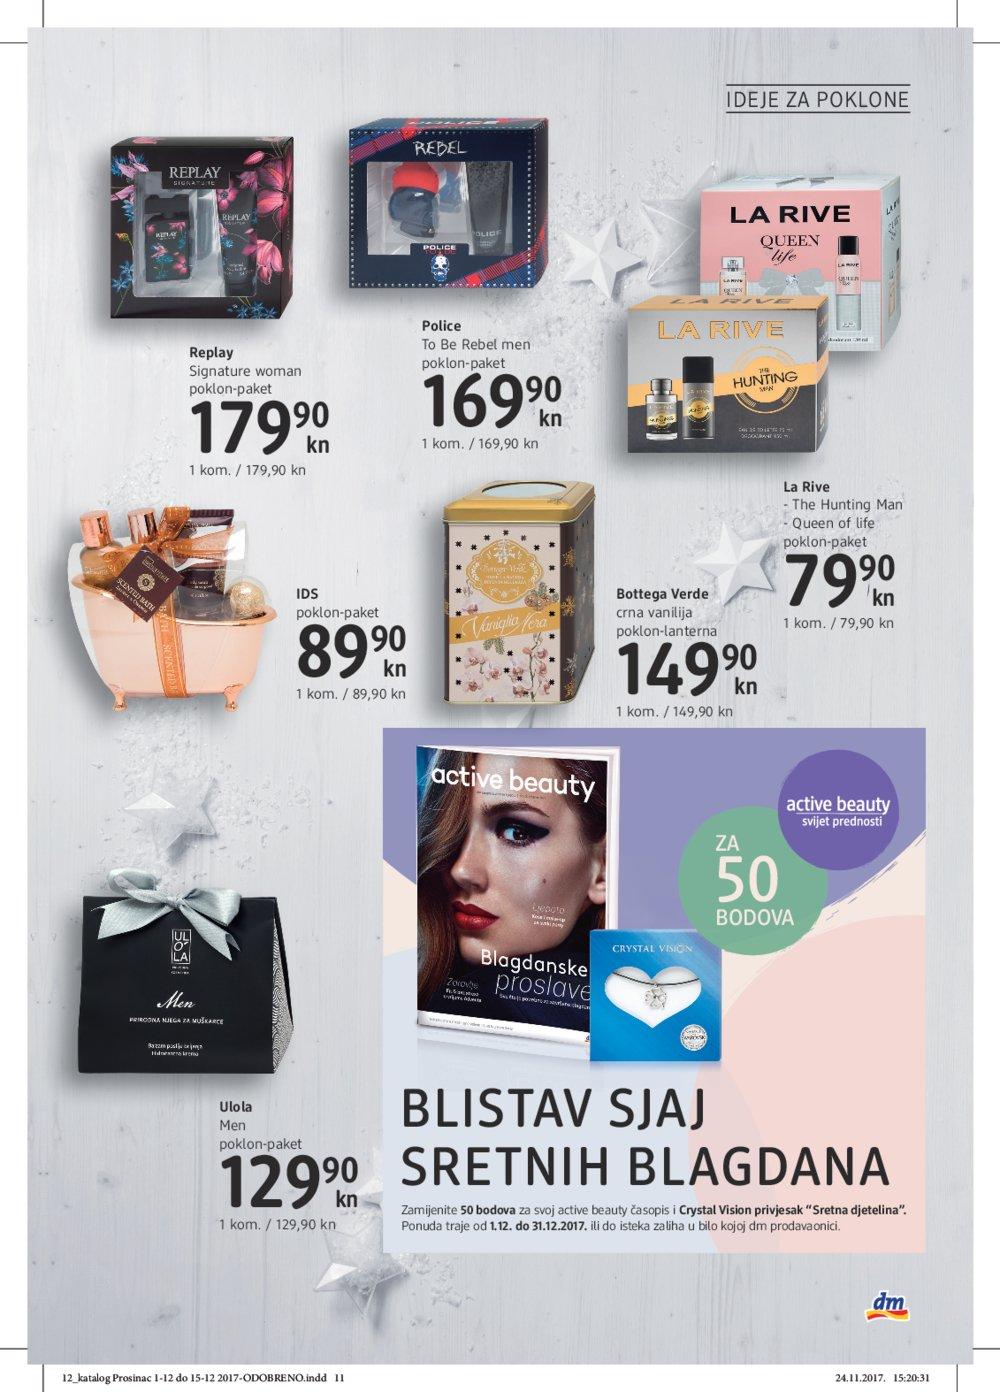 DM katalog Čarolija blagdana od 1.12. do 15.12.2017.